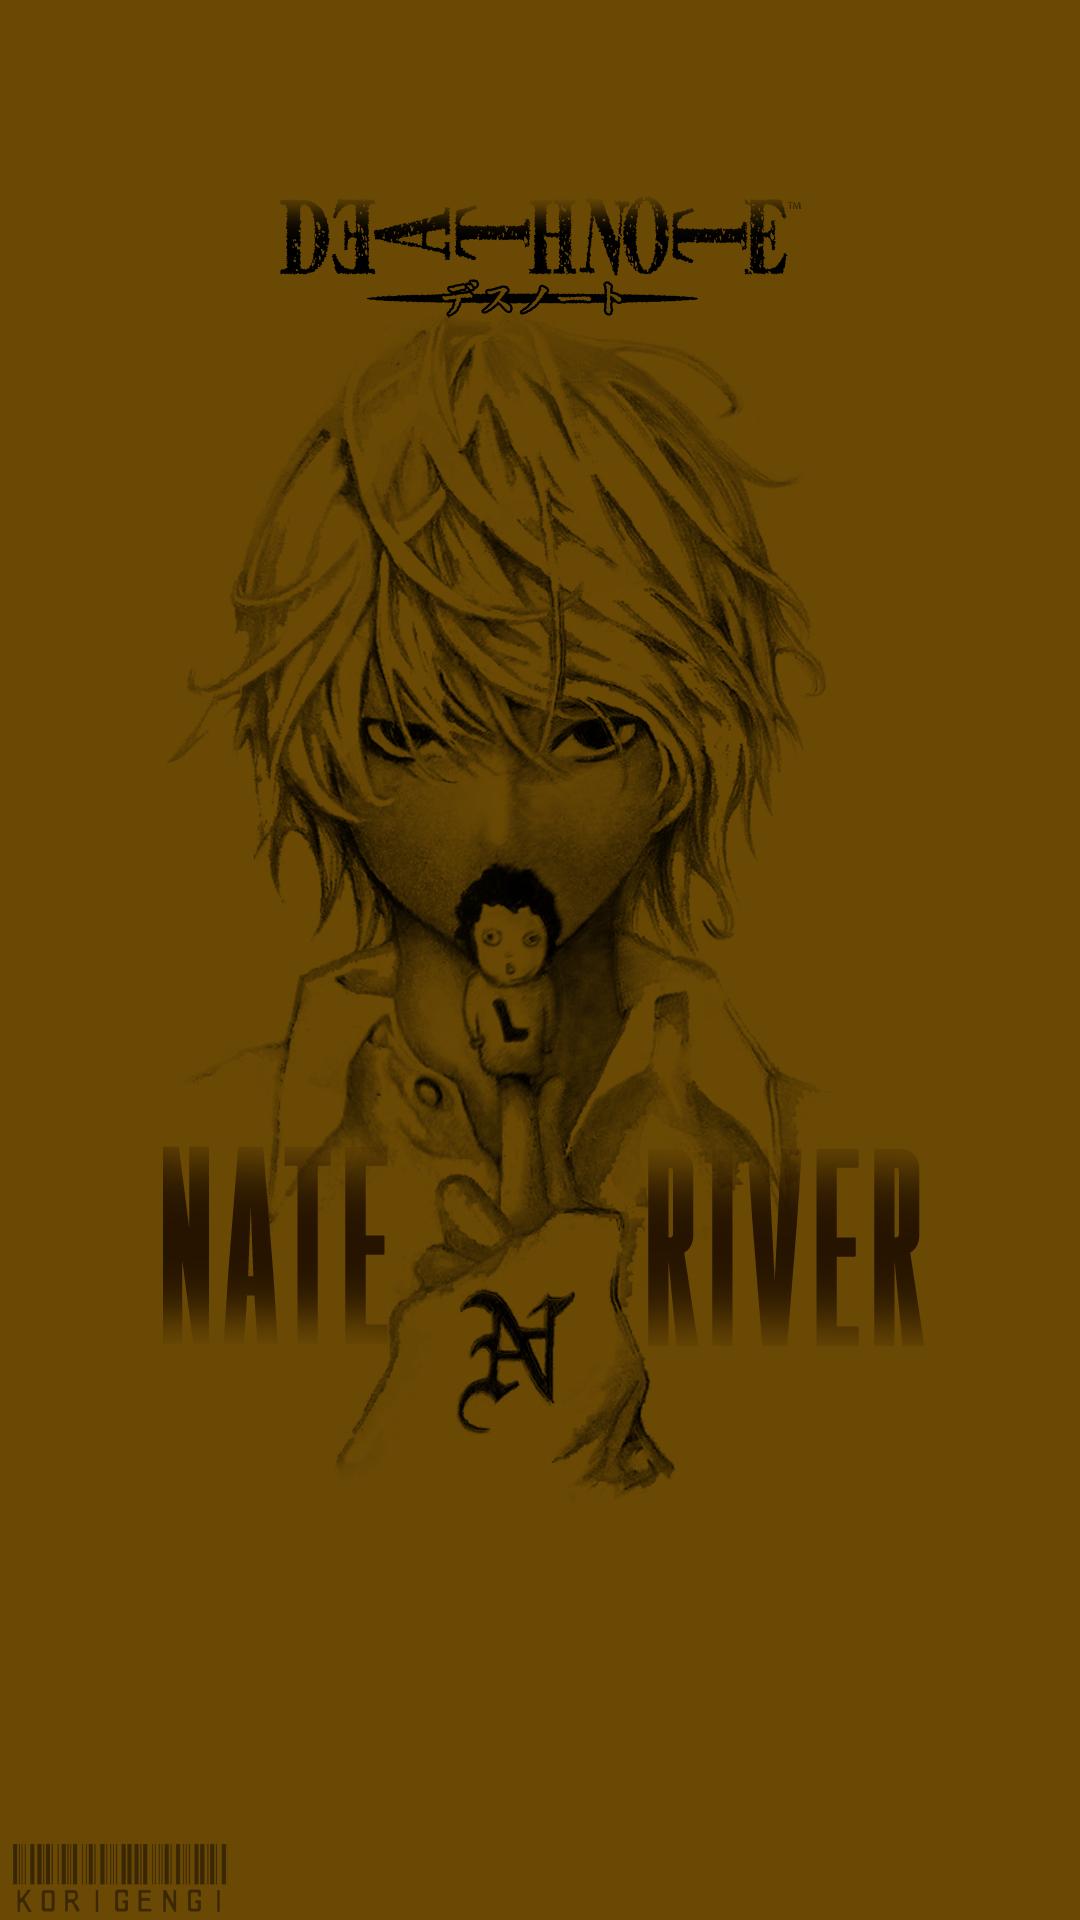 NATE RIVER -KRGNG.jpg